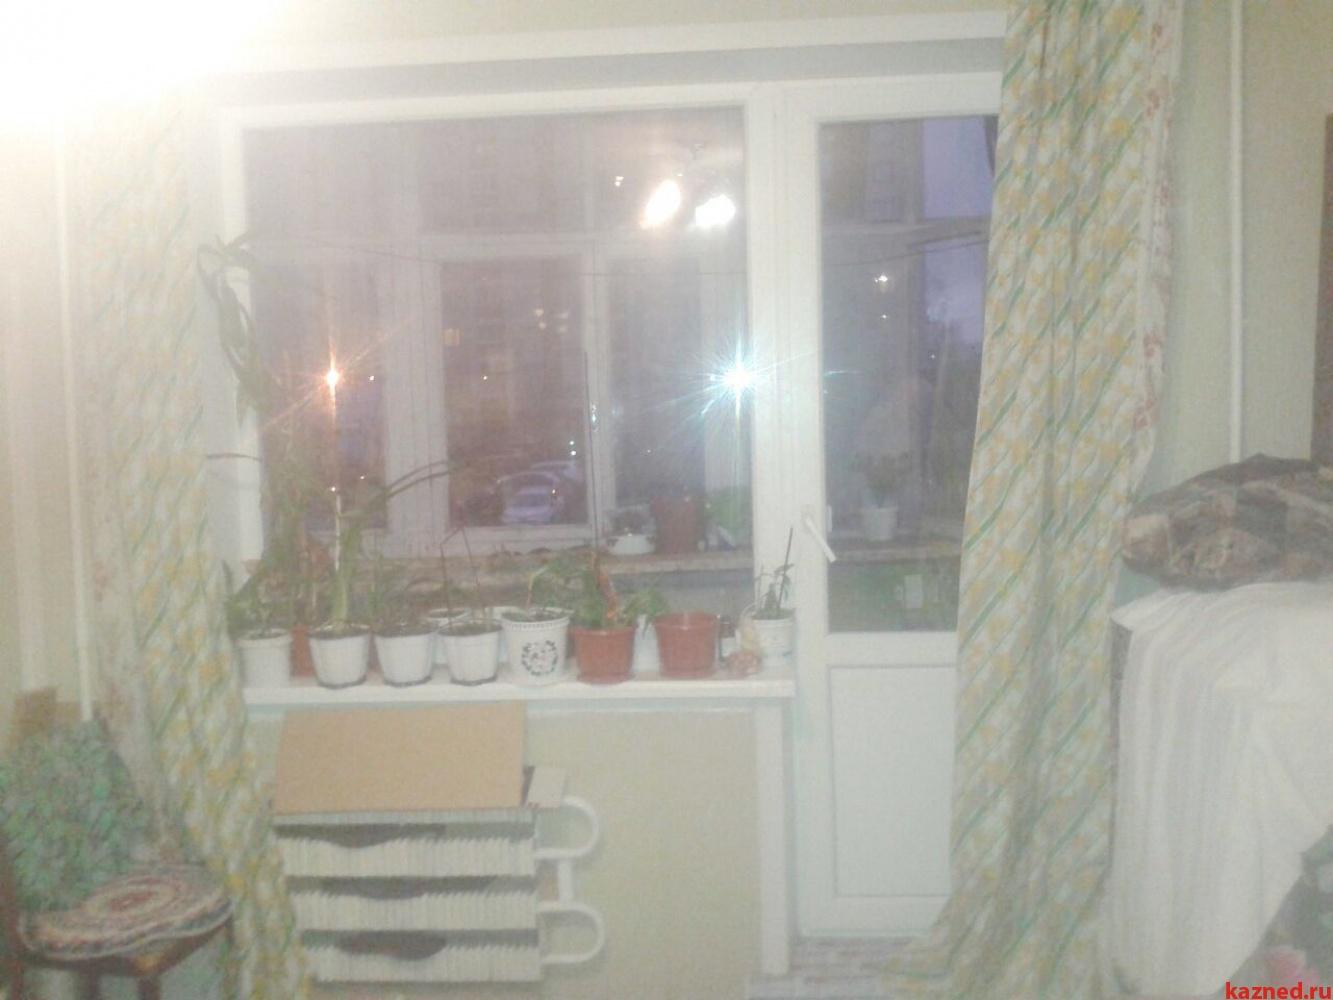 Продажа 1-к квартиры Фатыха Амирхана проспект, 91, 33 м² (миниатюра №4)